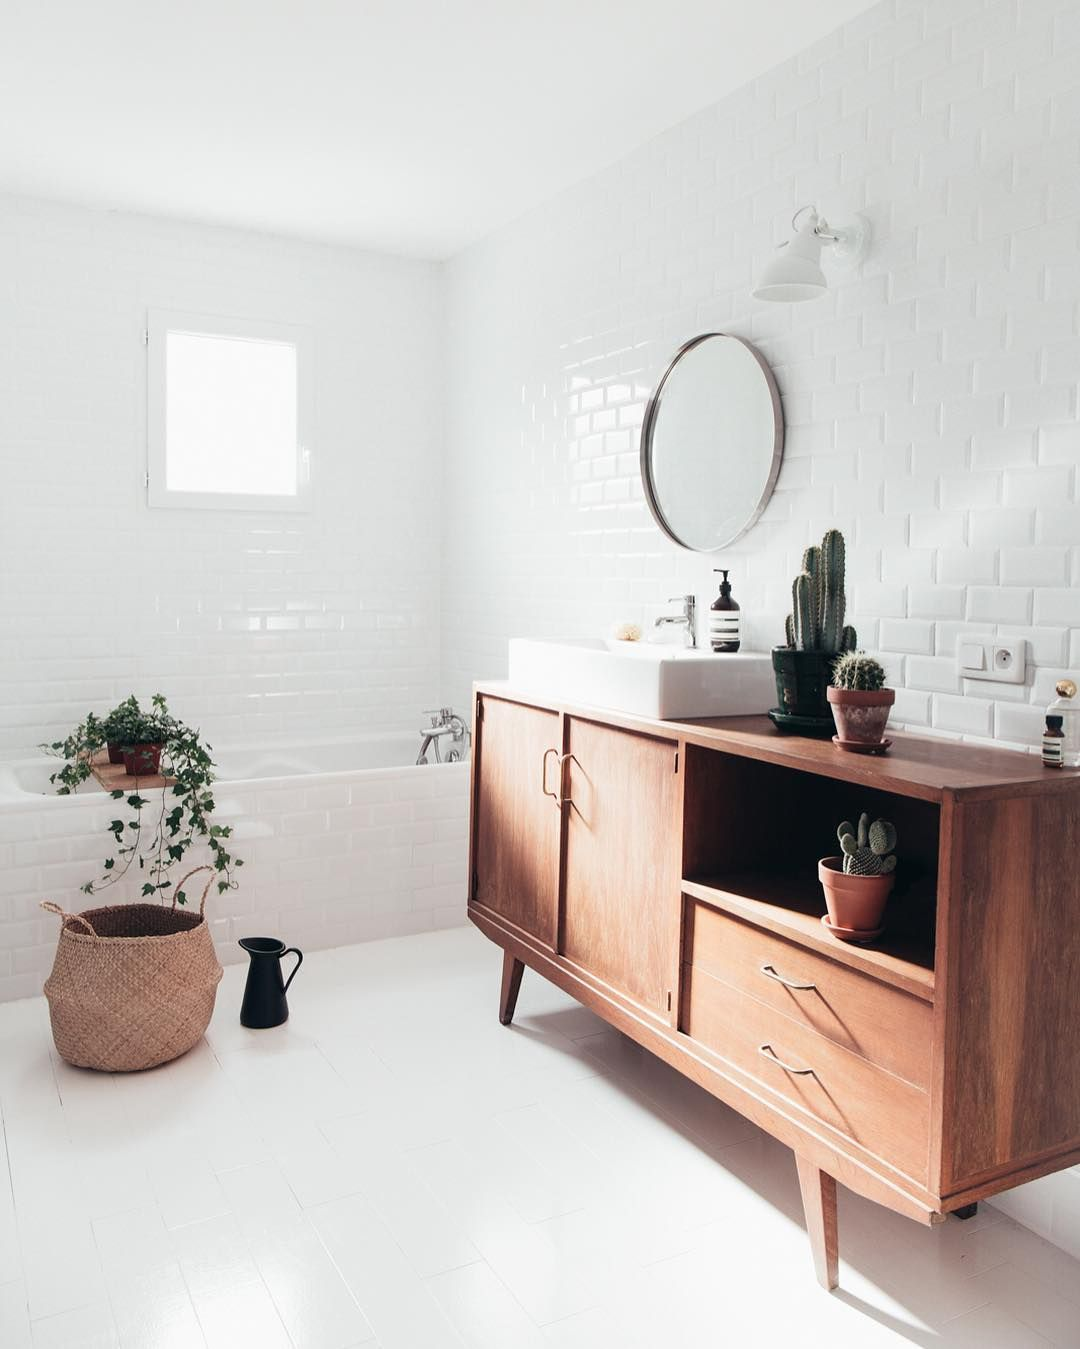 Top 10 stunning mid-century bathrooms on instagram